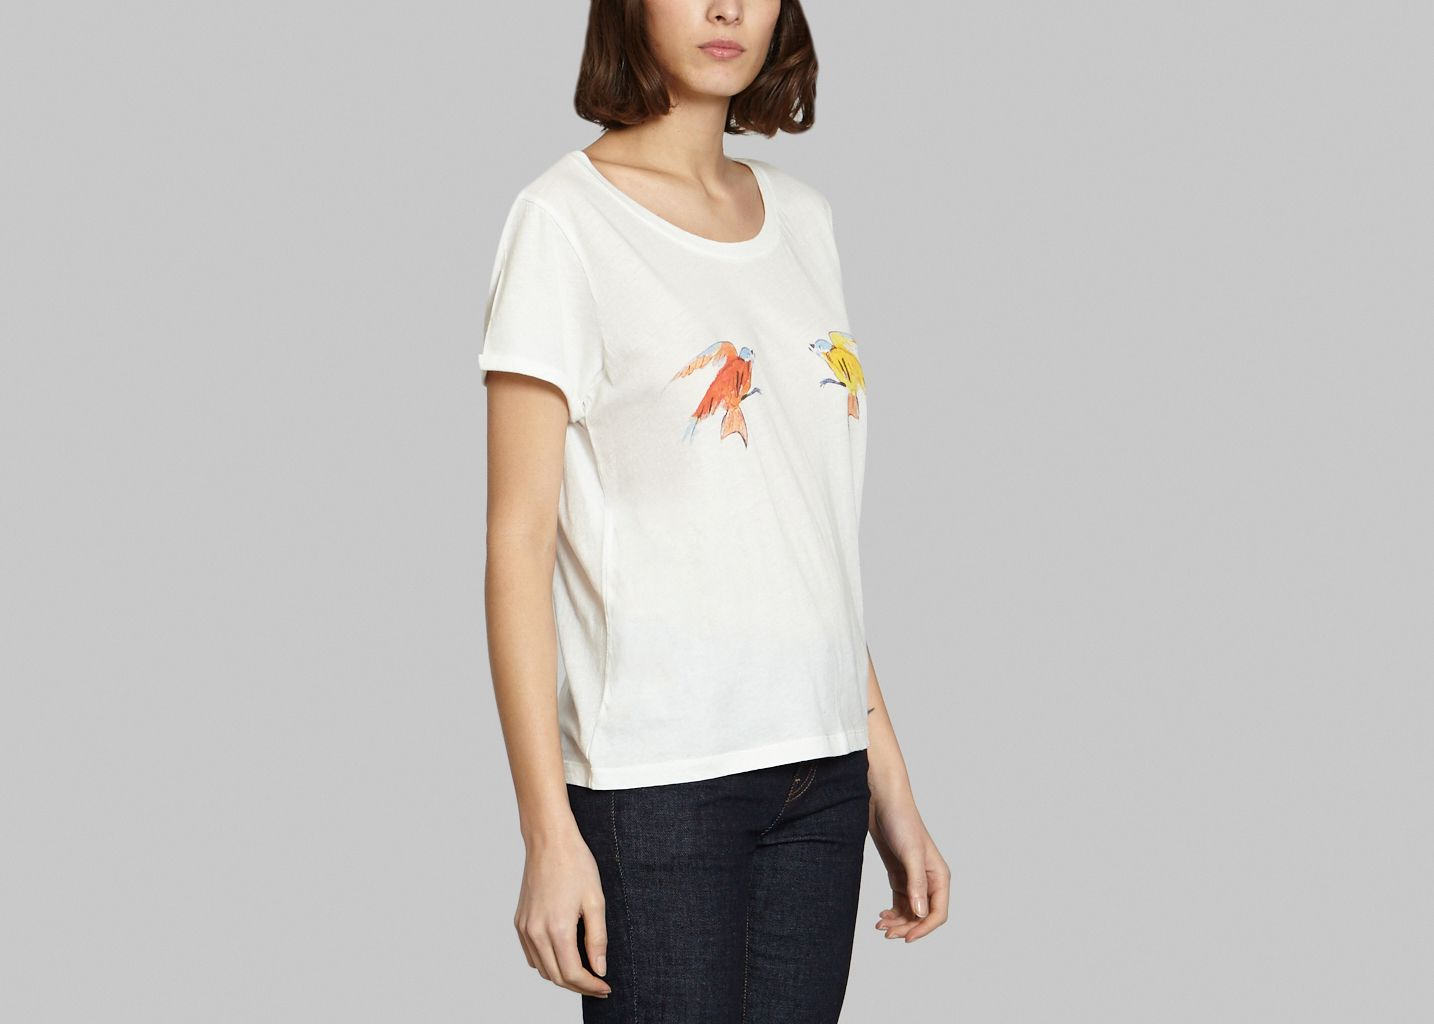 Tee-shirt Tits Birds - G.Kero